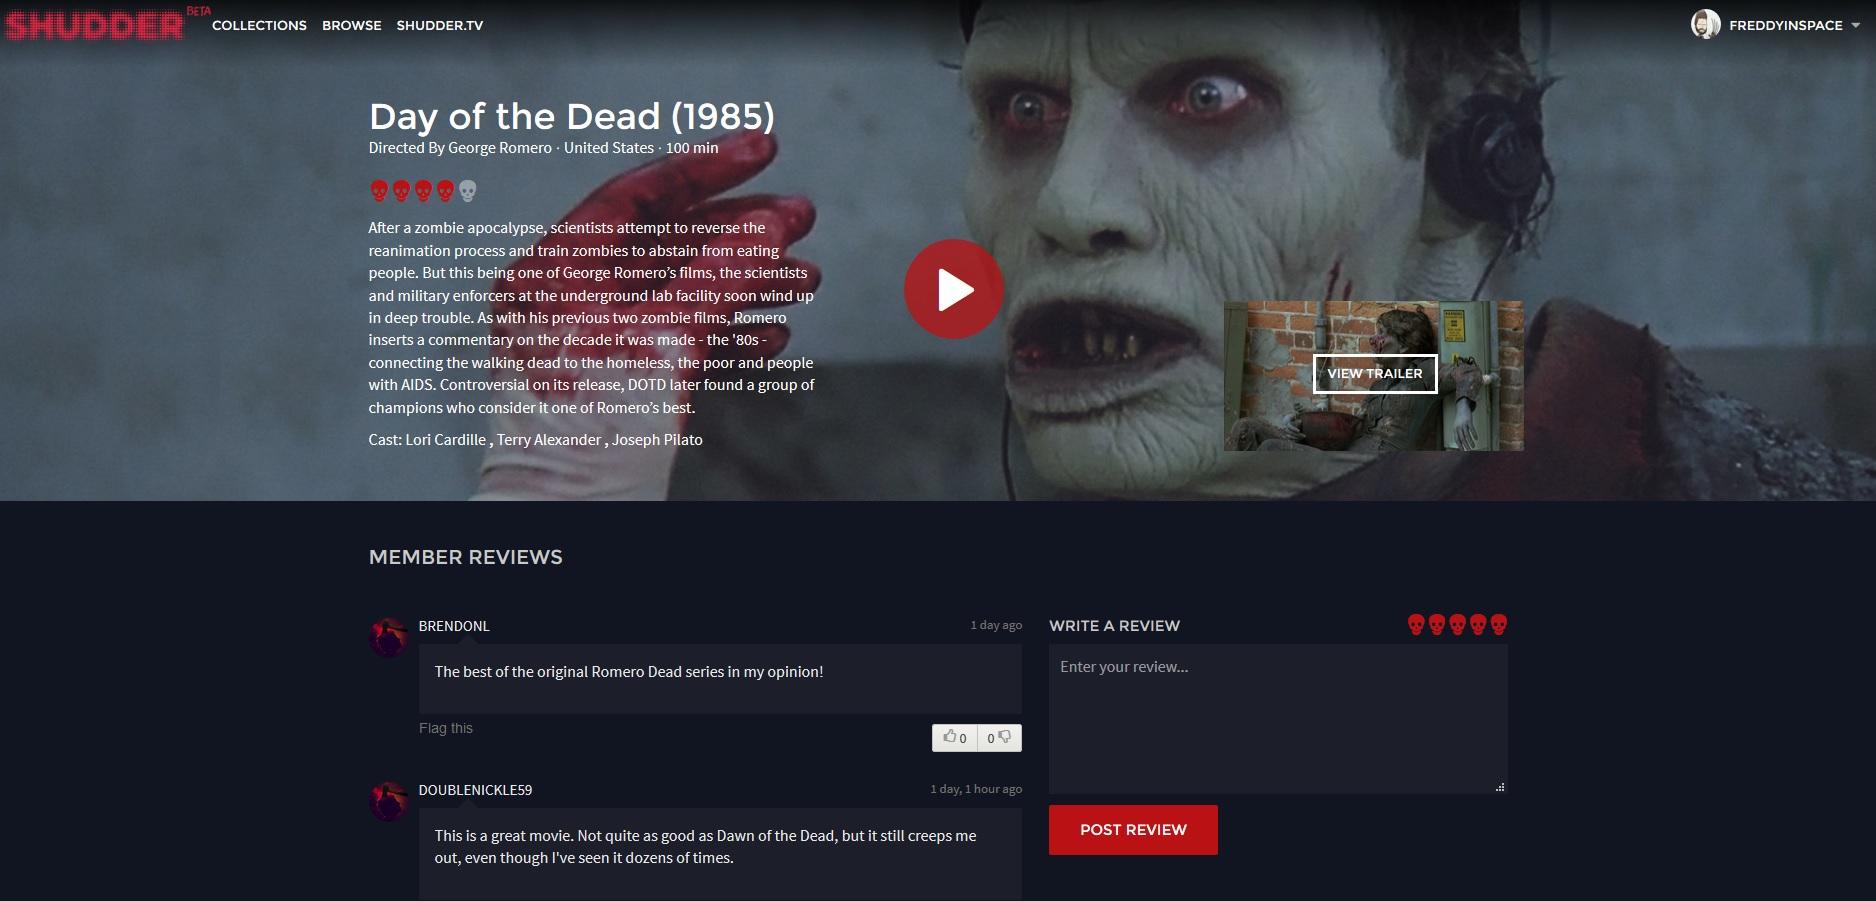 Netflix Horror Shudder